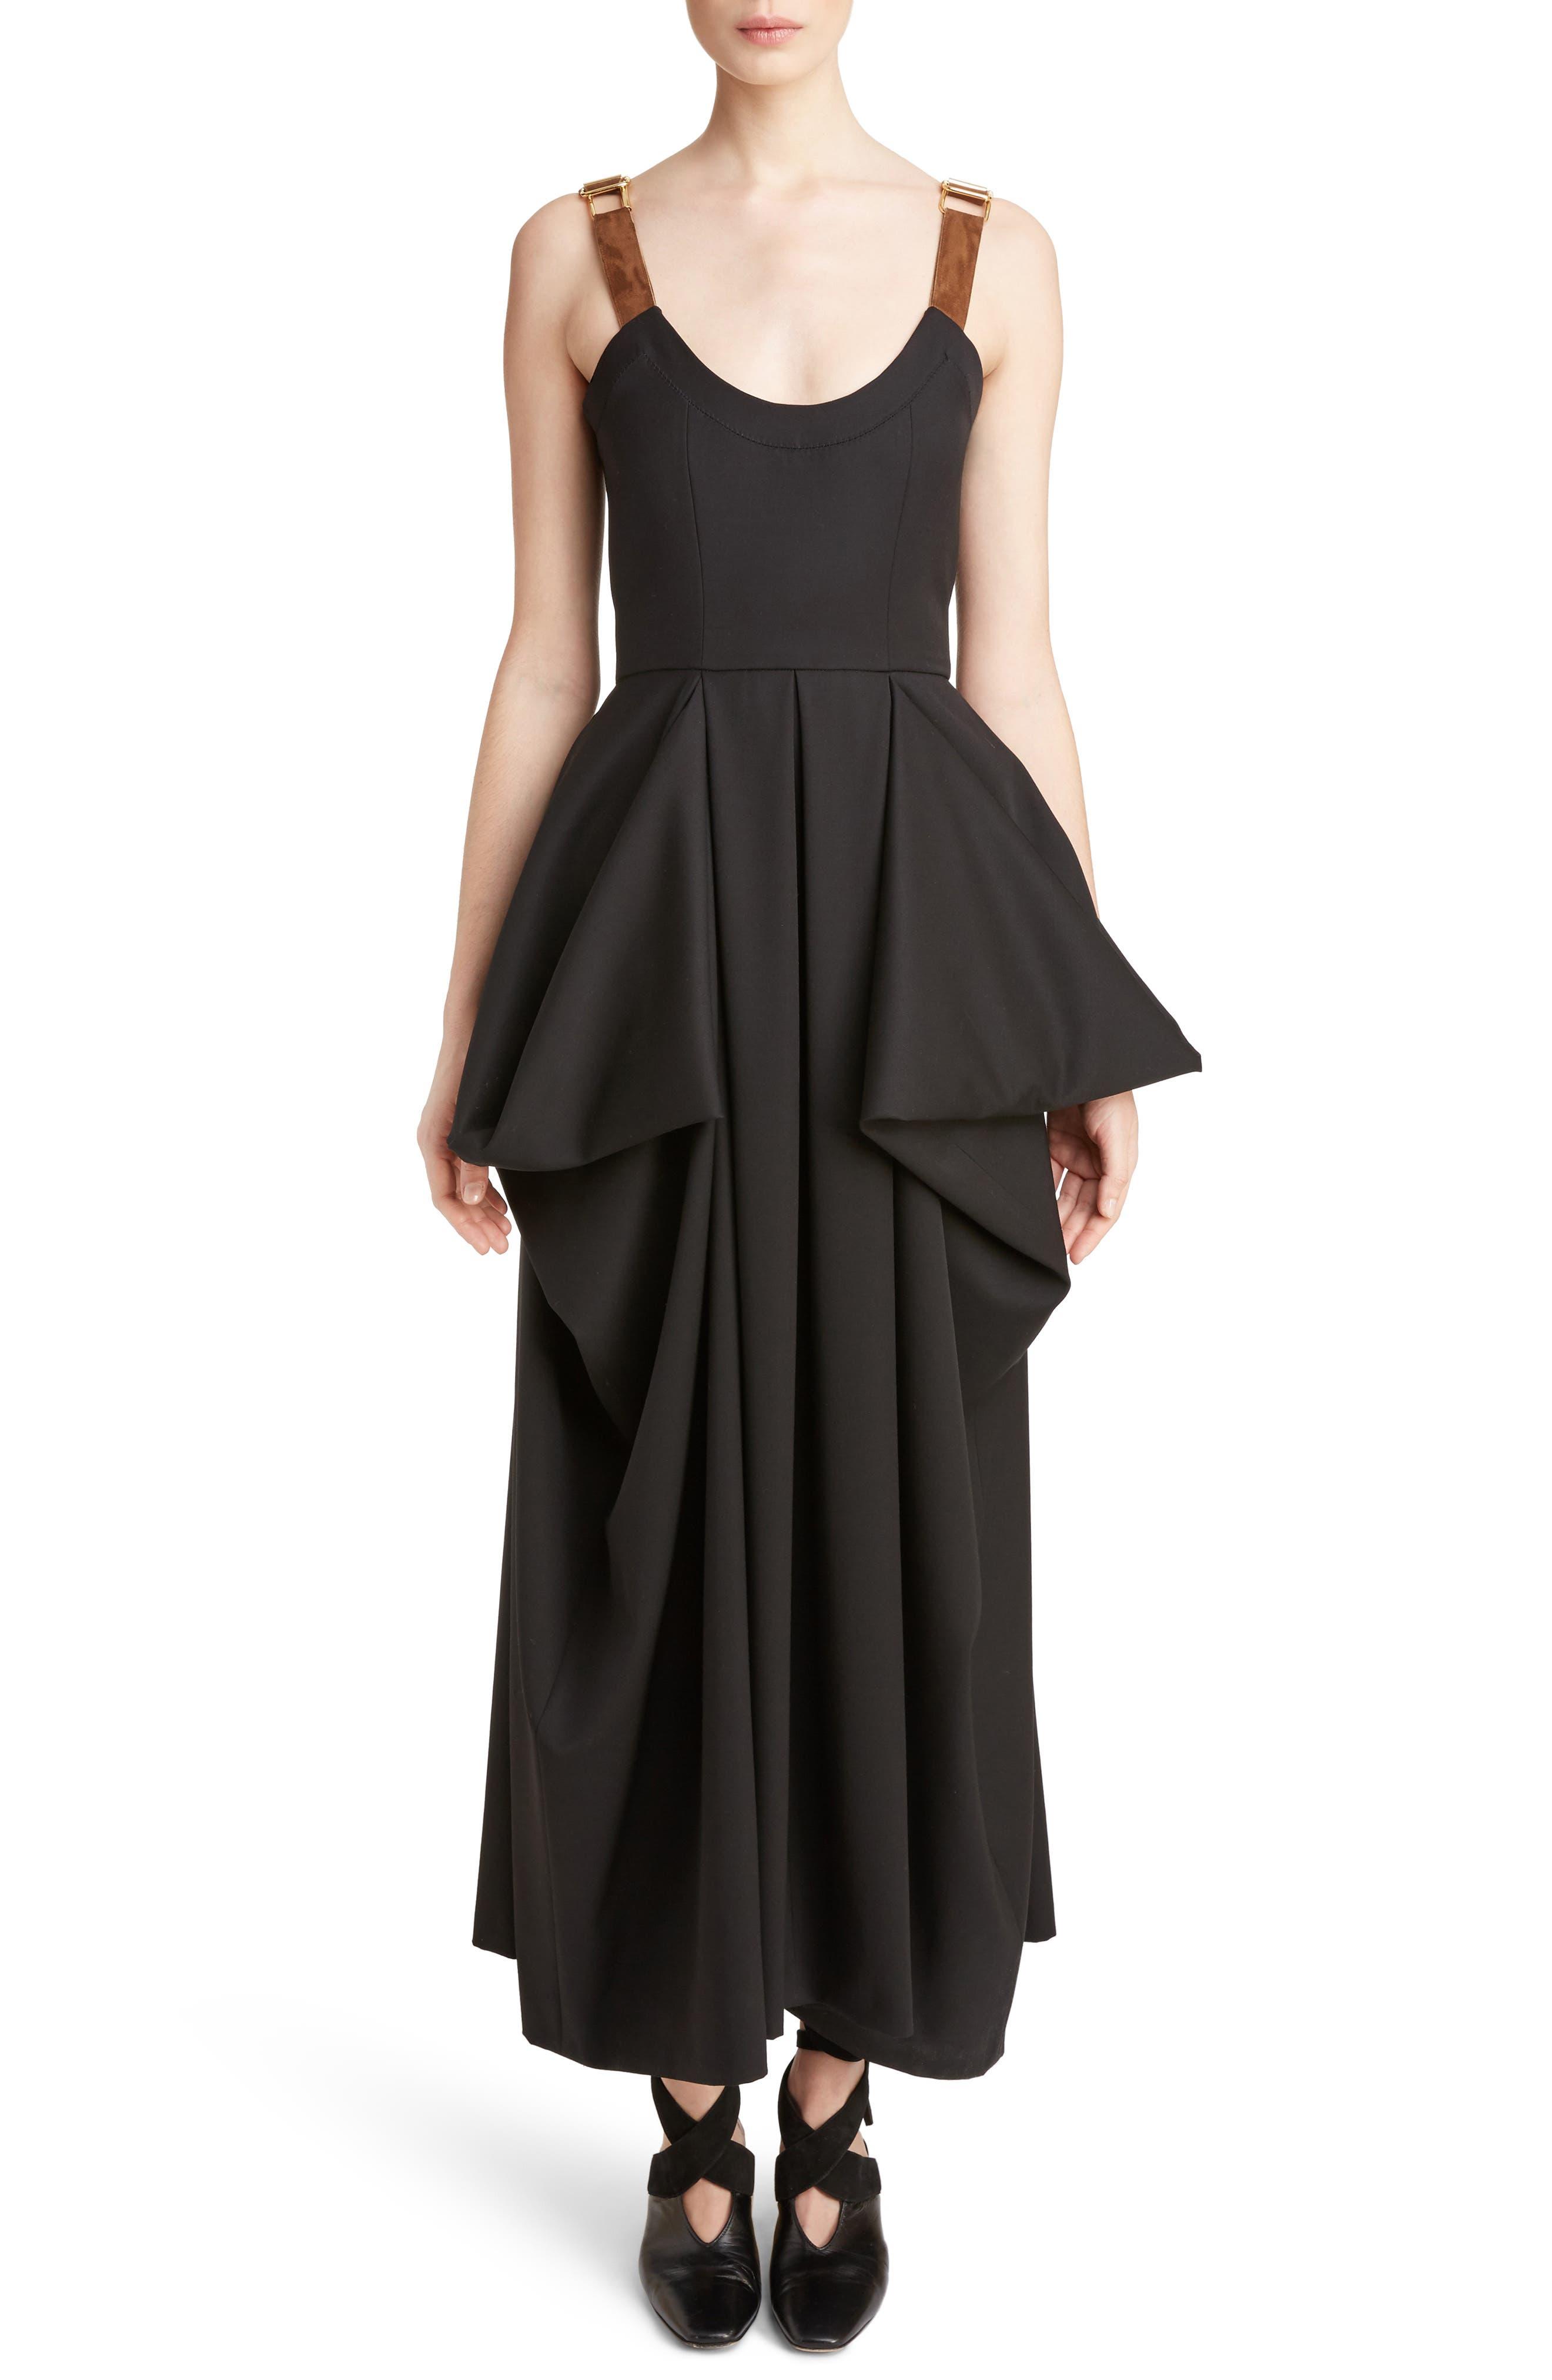 Main Image - J.W.ANDERSON Drape Pocket Wool Dress